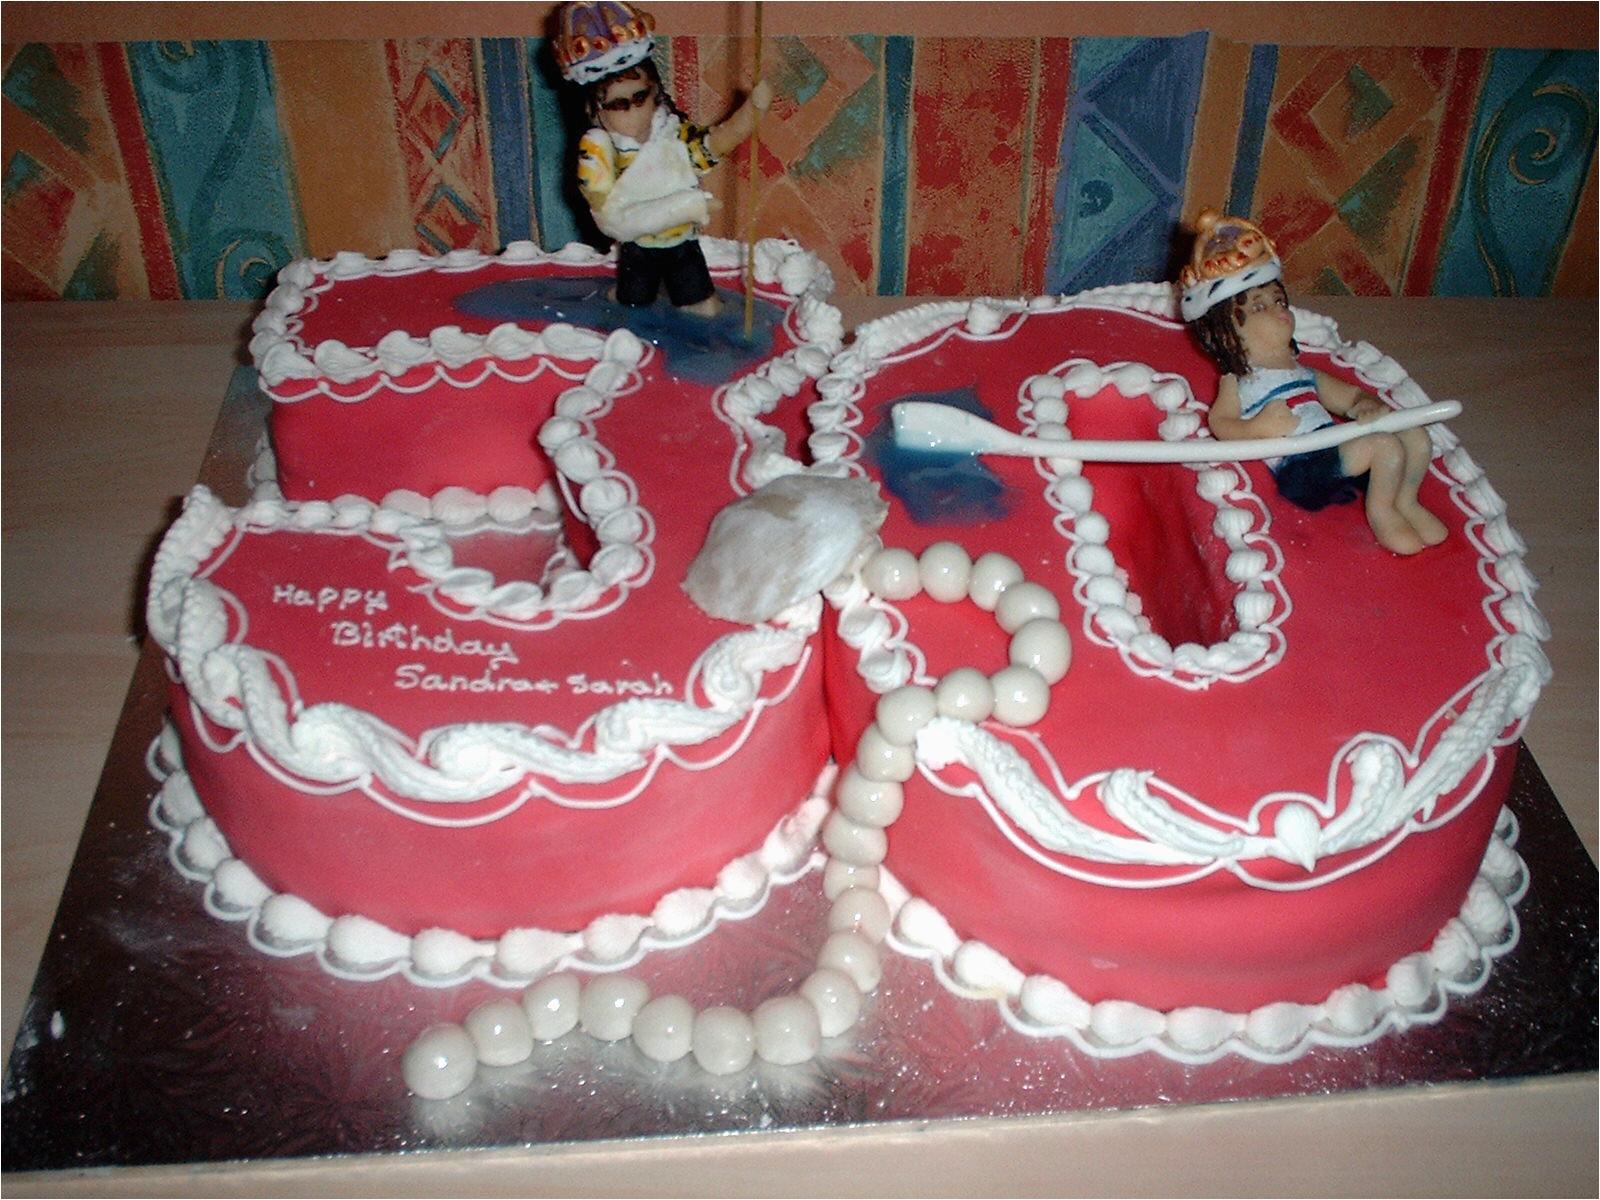 creative ideas for 30th birthday cakes